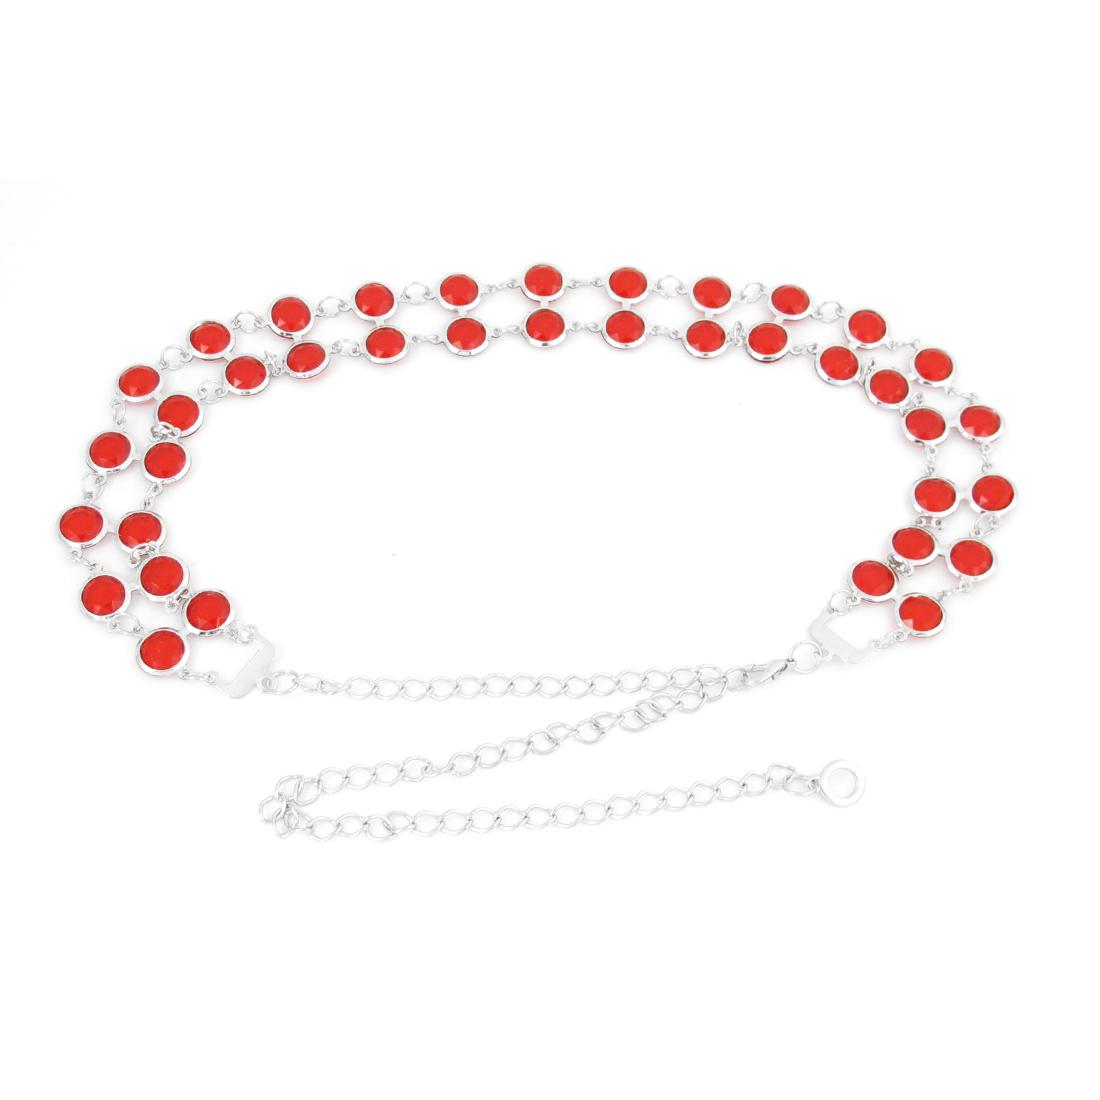 Ladies Rhinestones Inlaid Metallic Waist Chain Belt Red